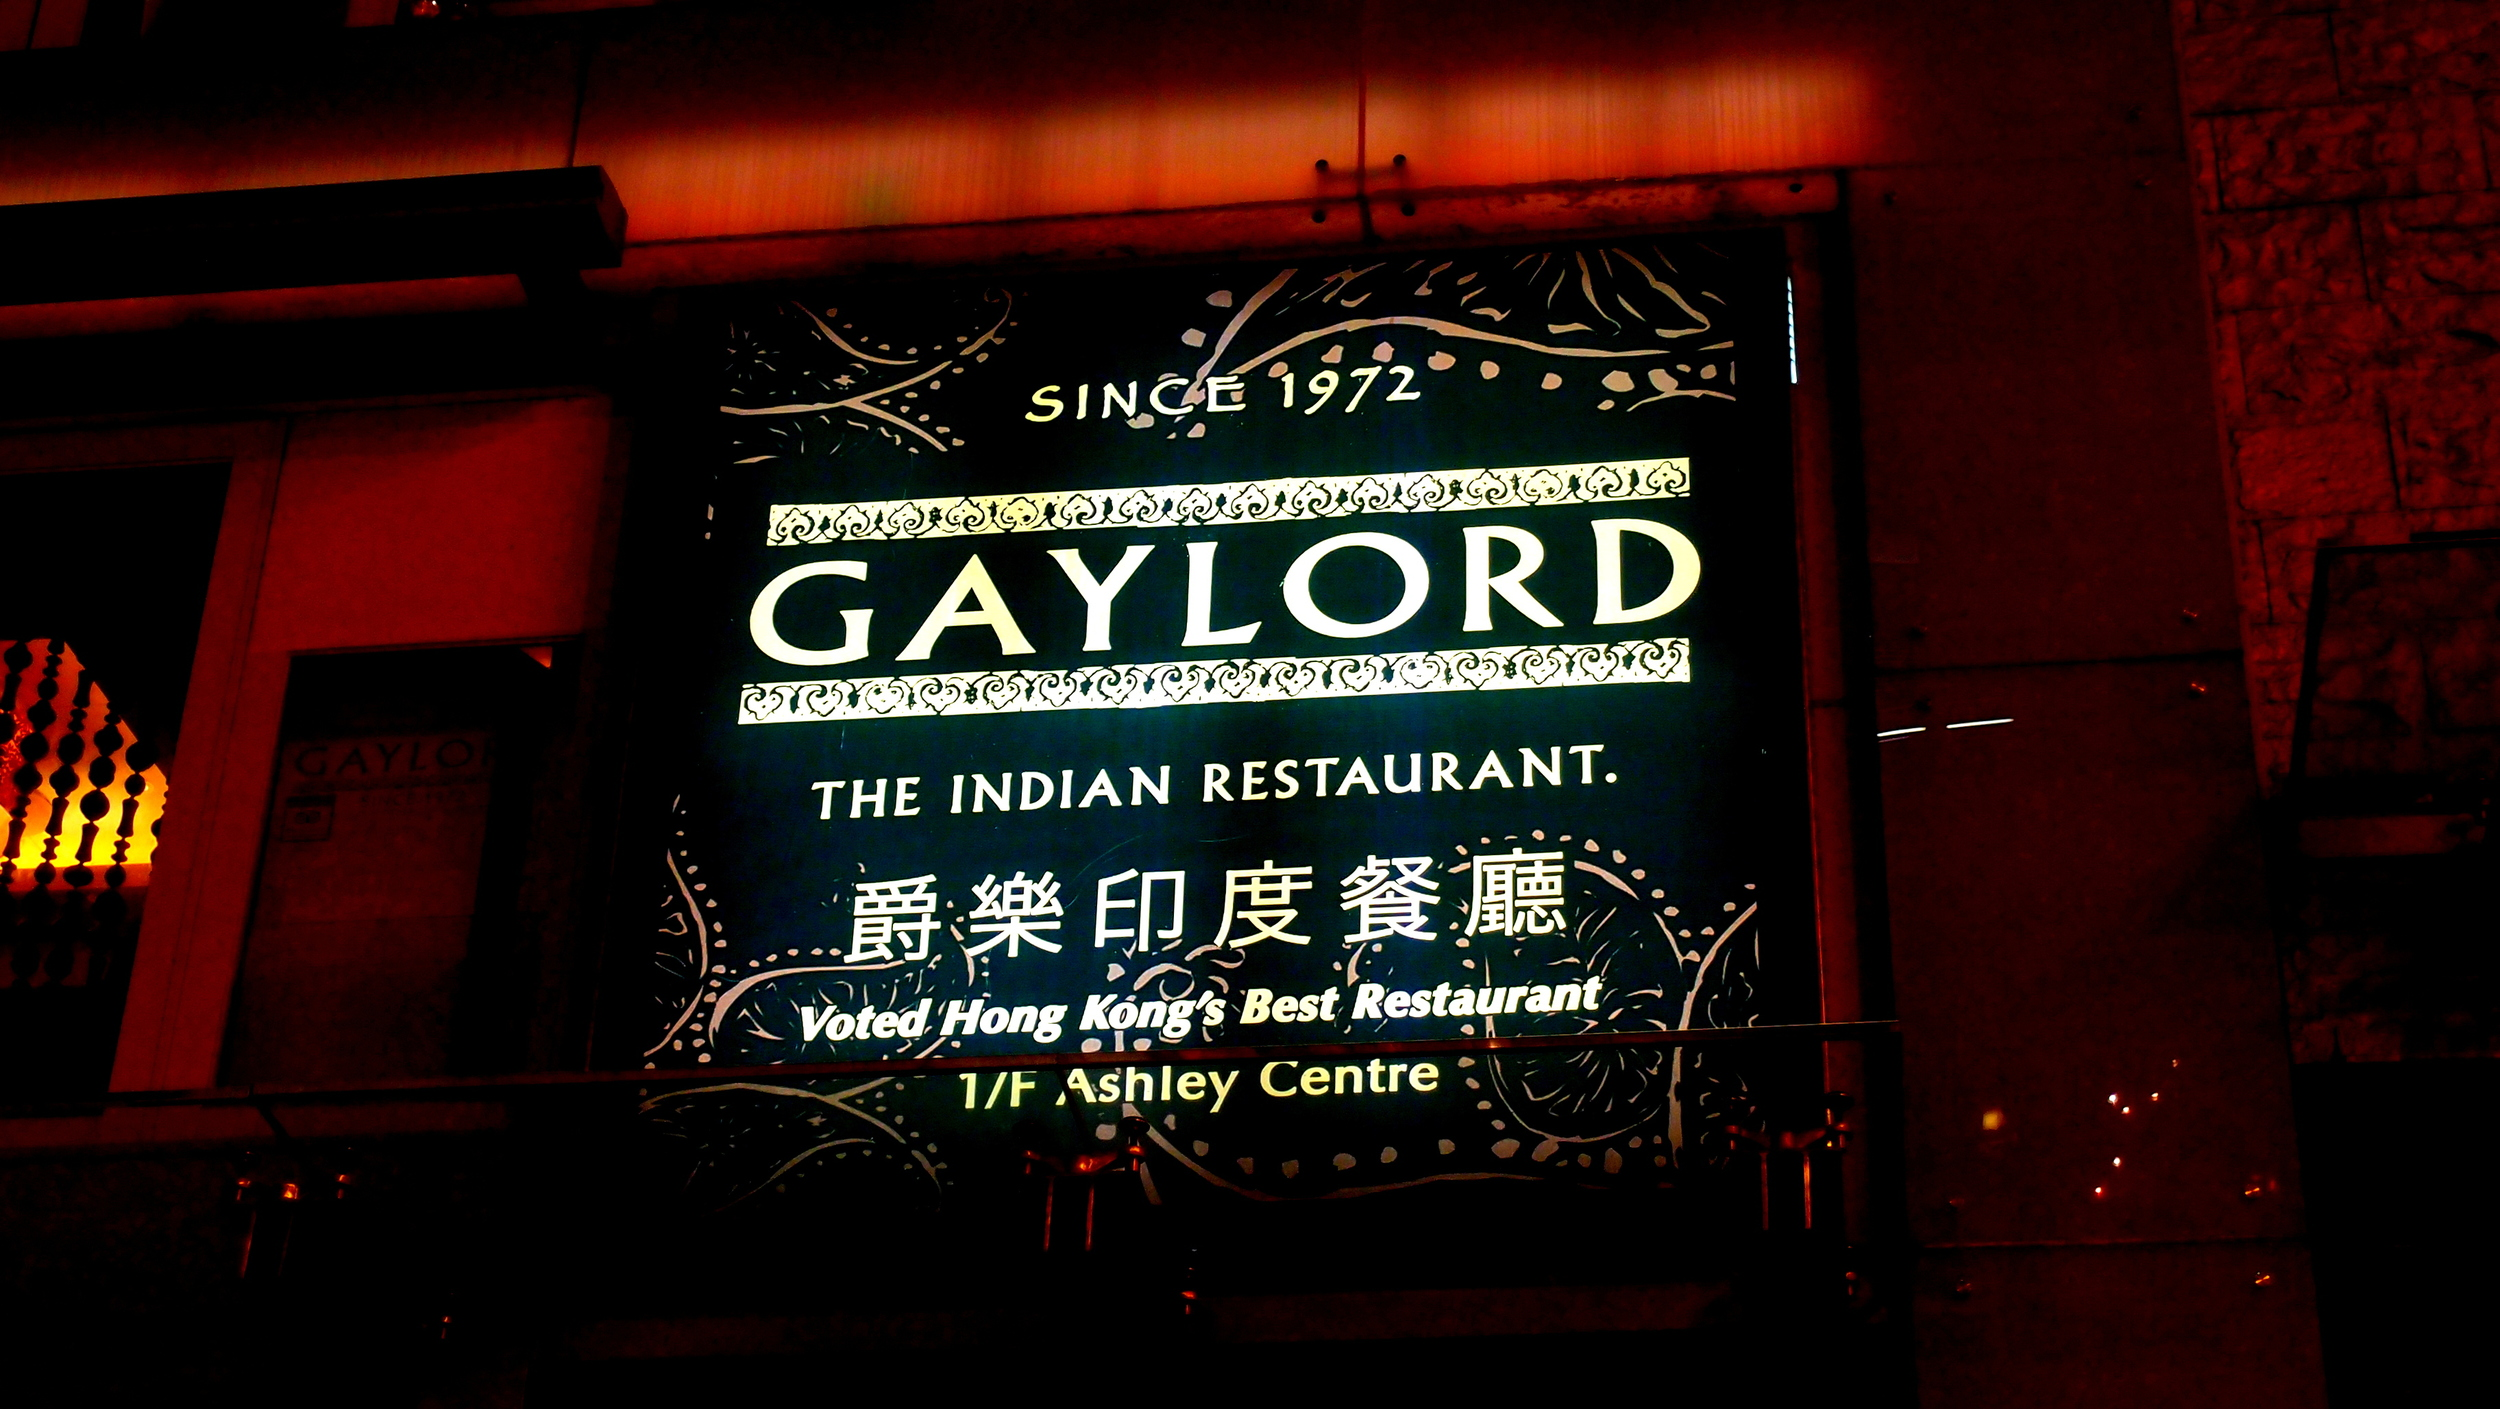 Unfortunate name for a decent restaurant